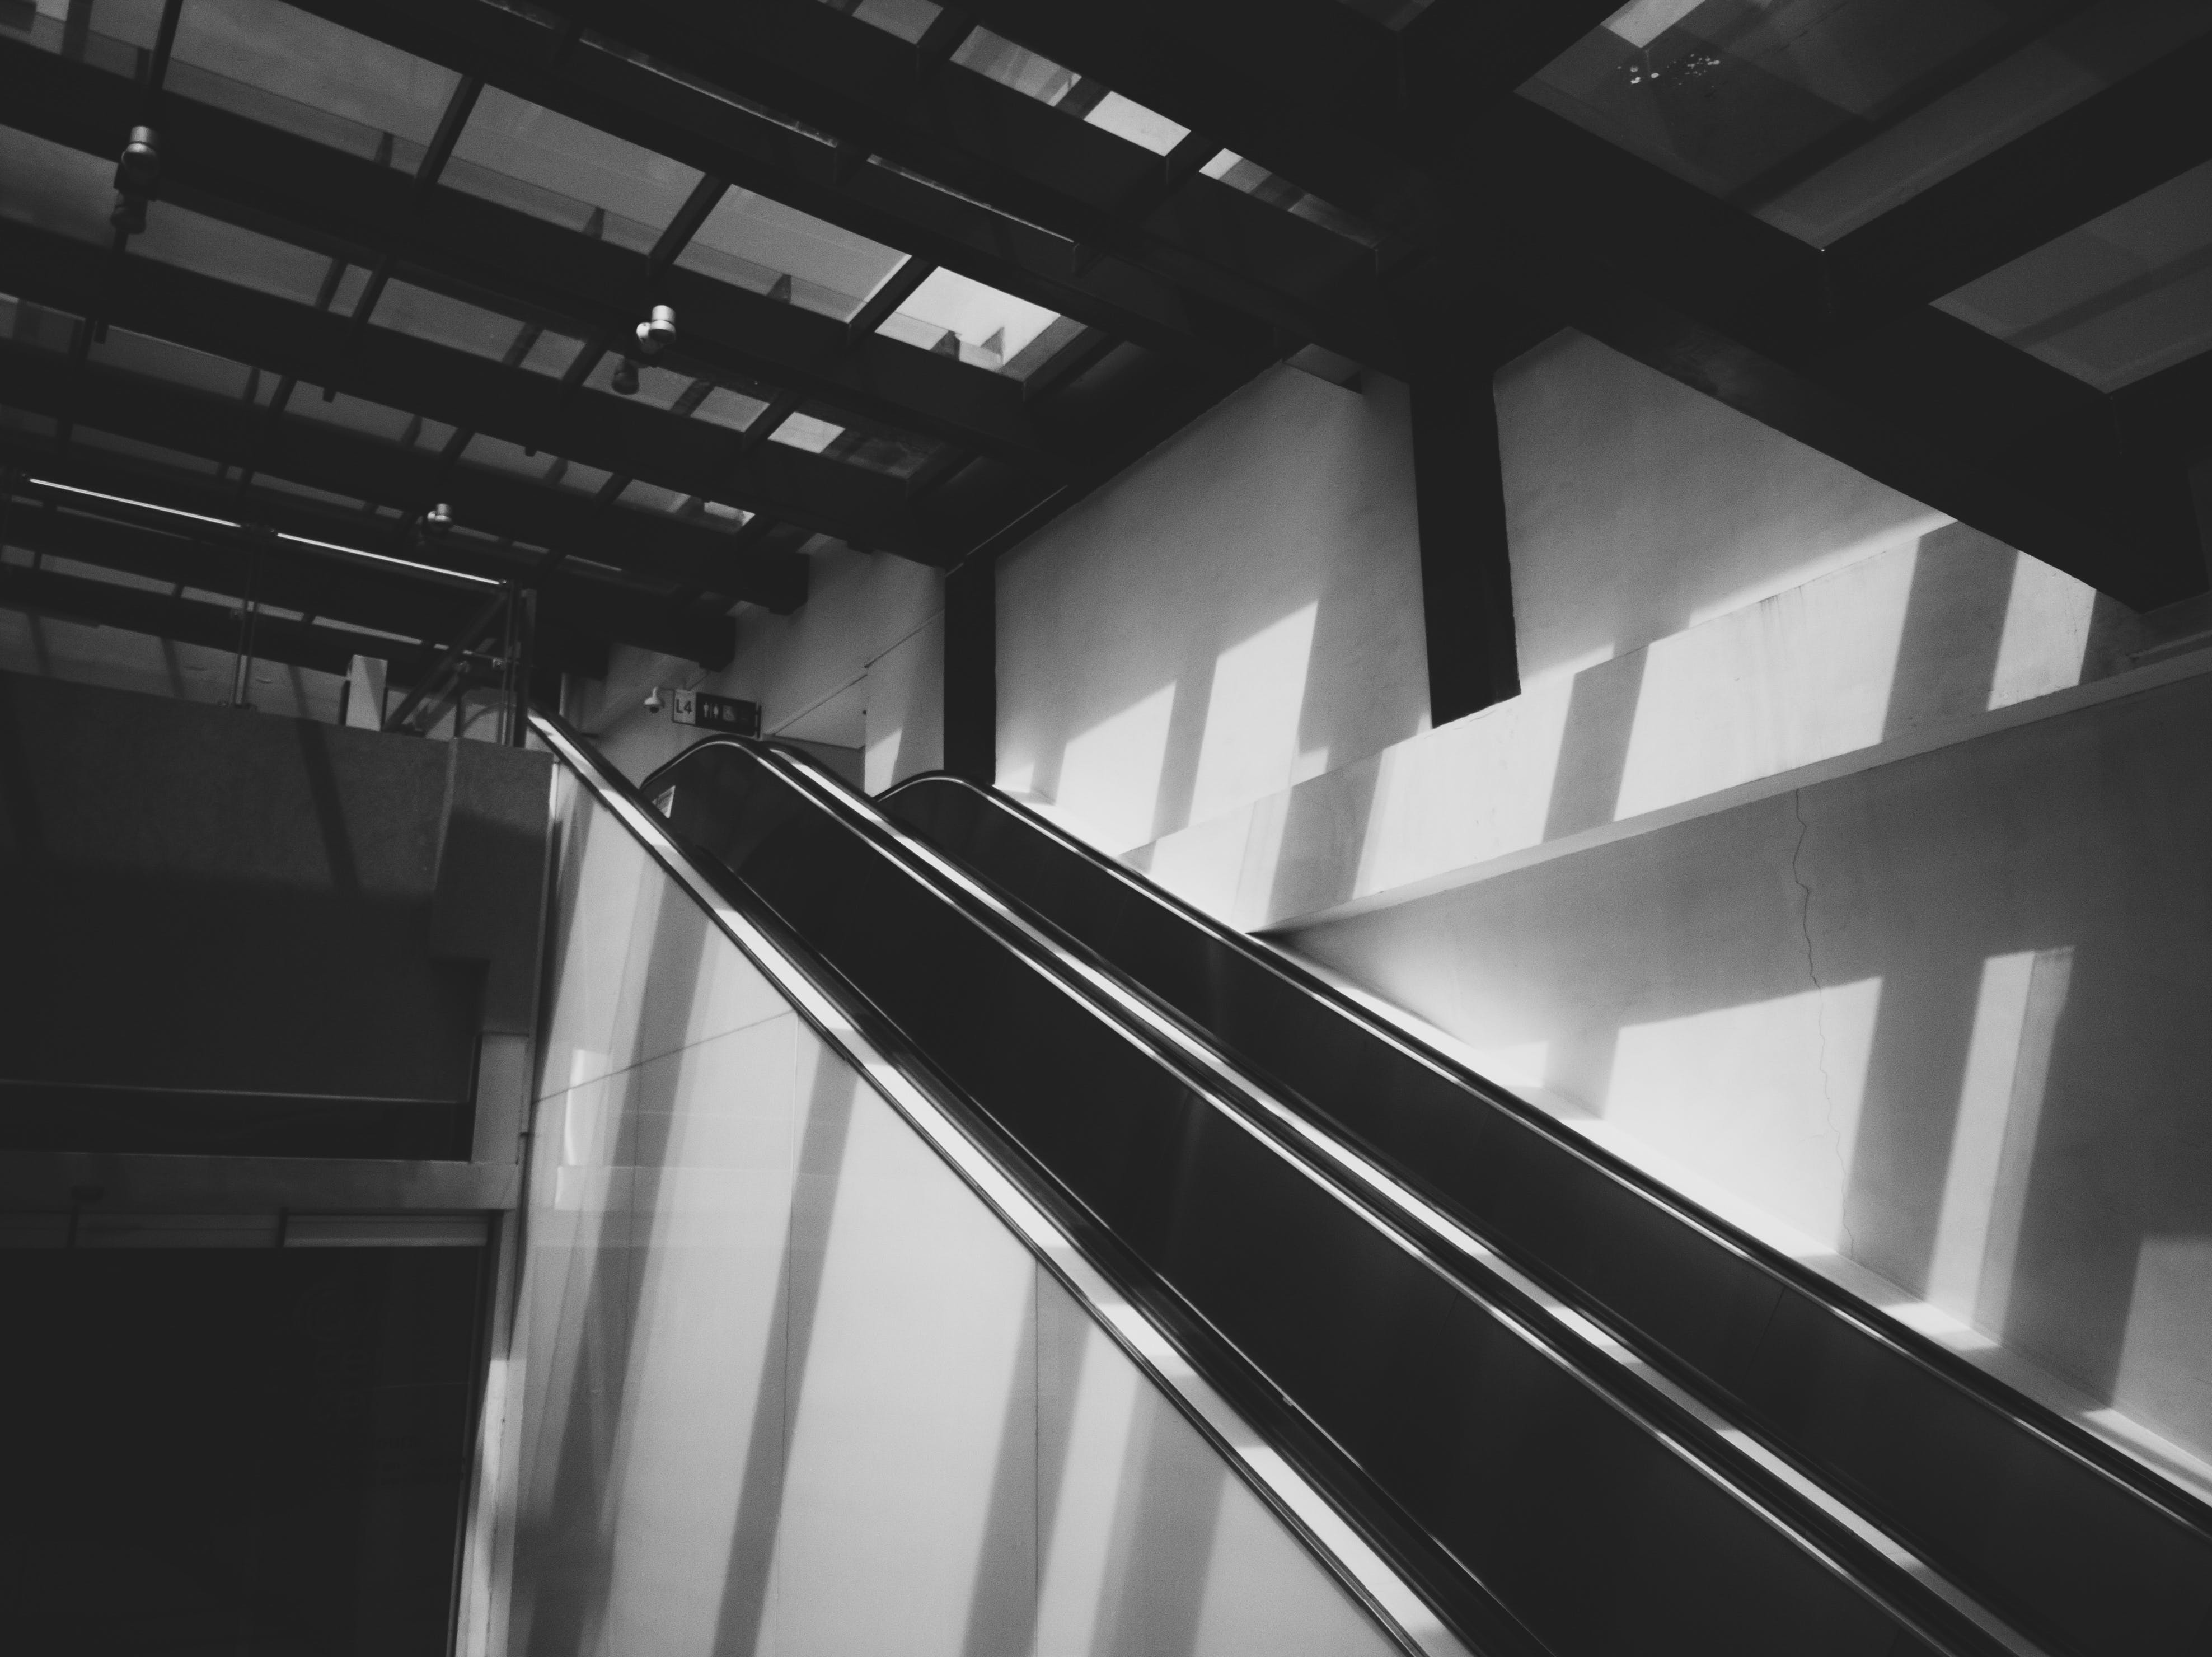 Free stock photo of architecture, black and white, escalator, mall